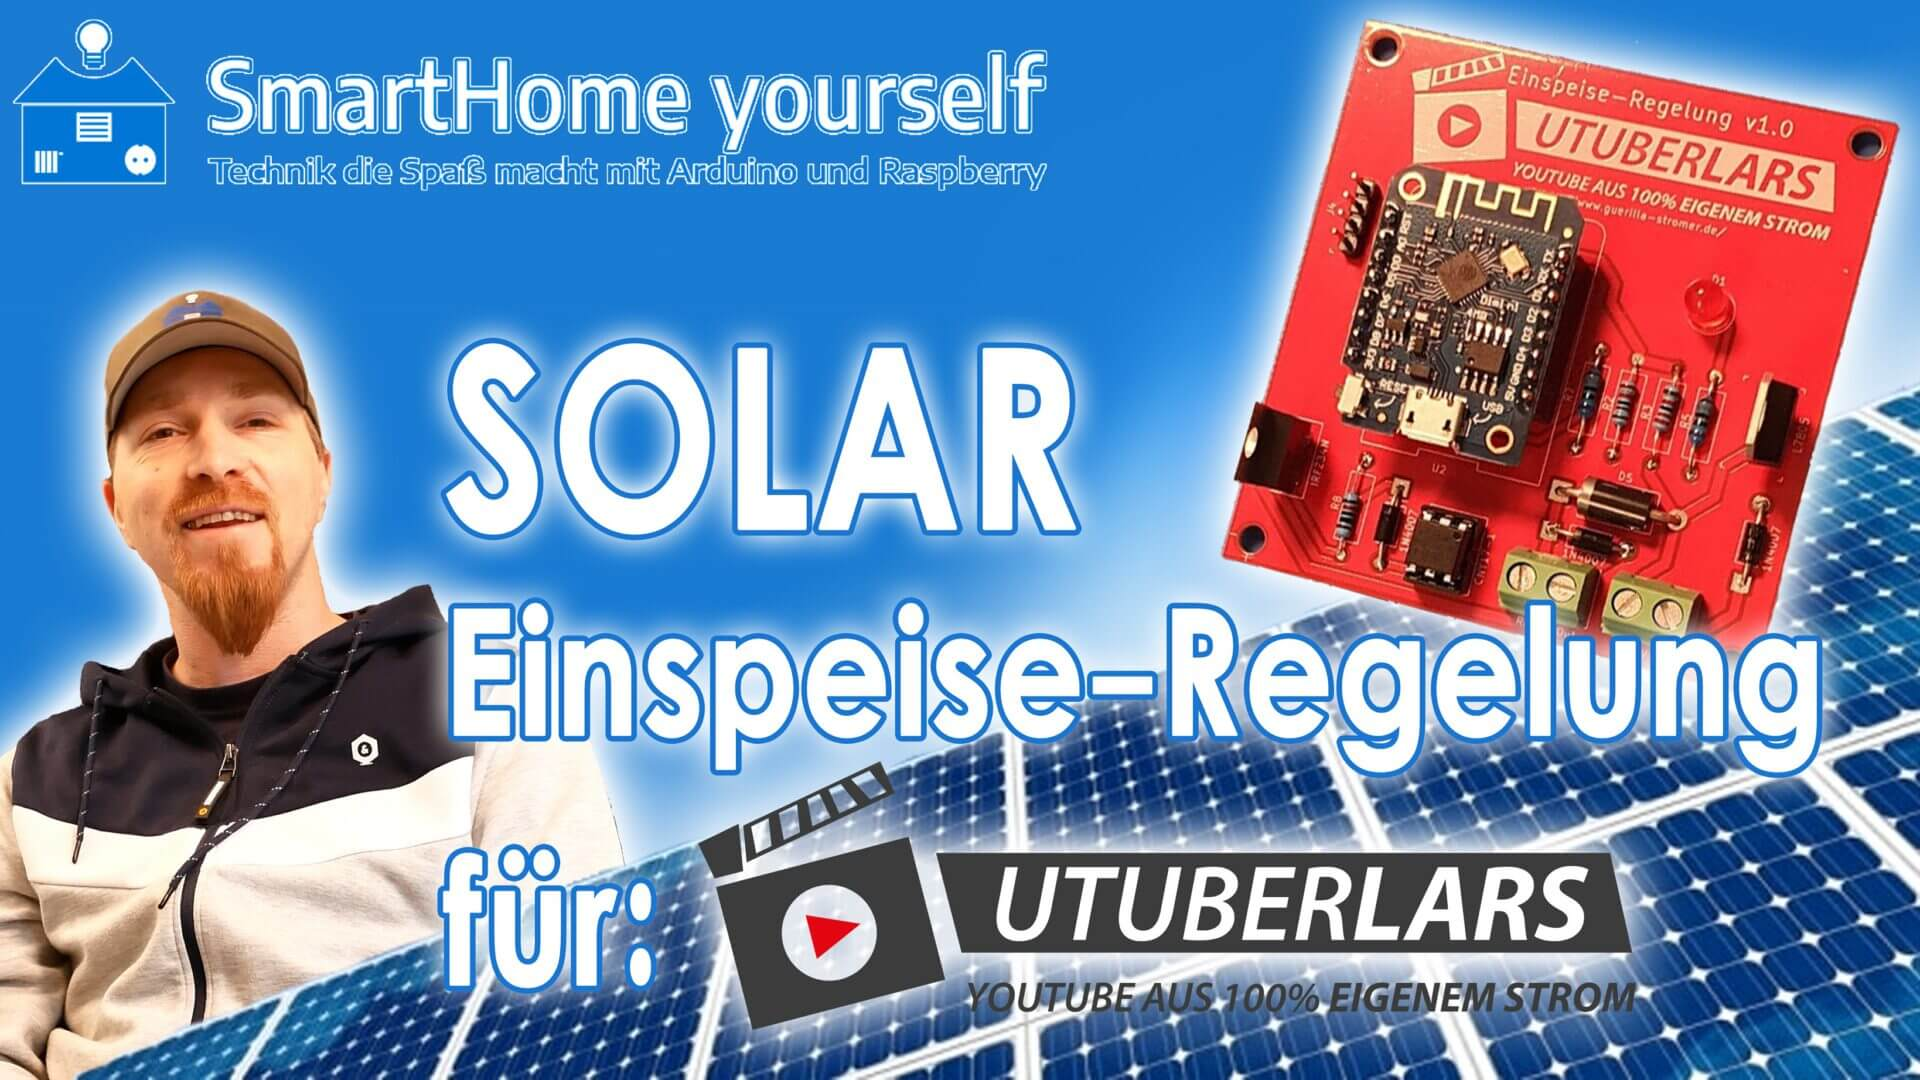 Solar Einspeise-Regelung (UTuberLars)